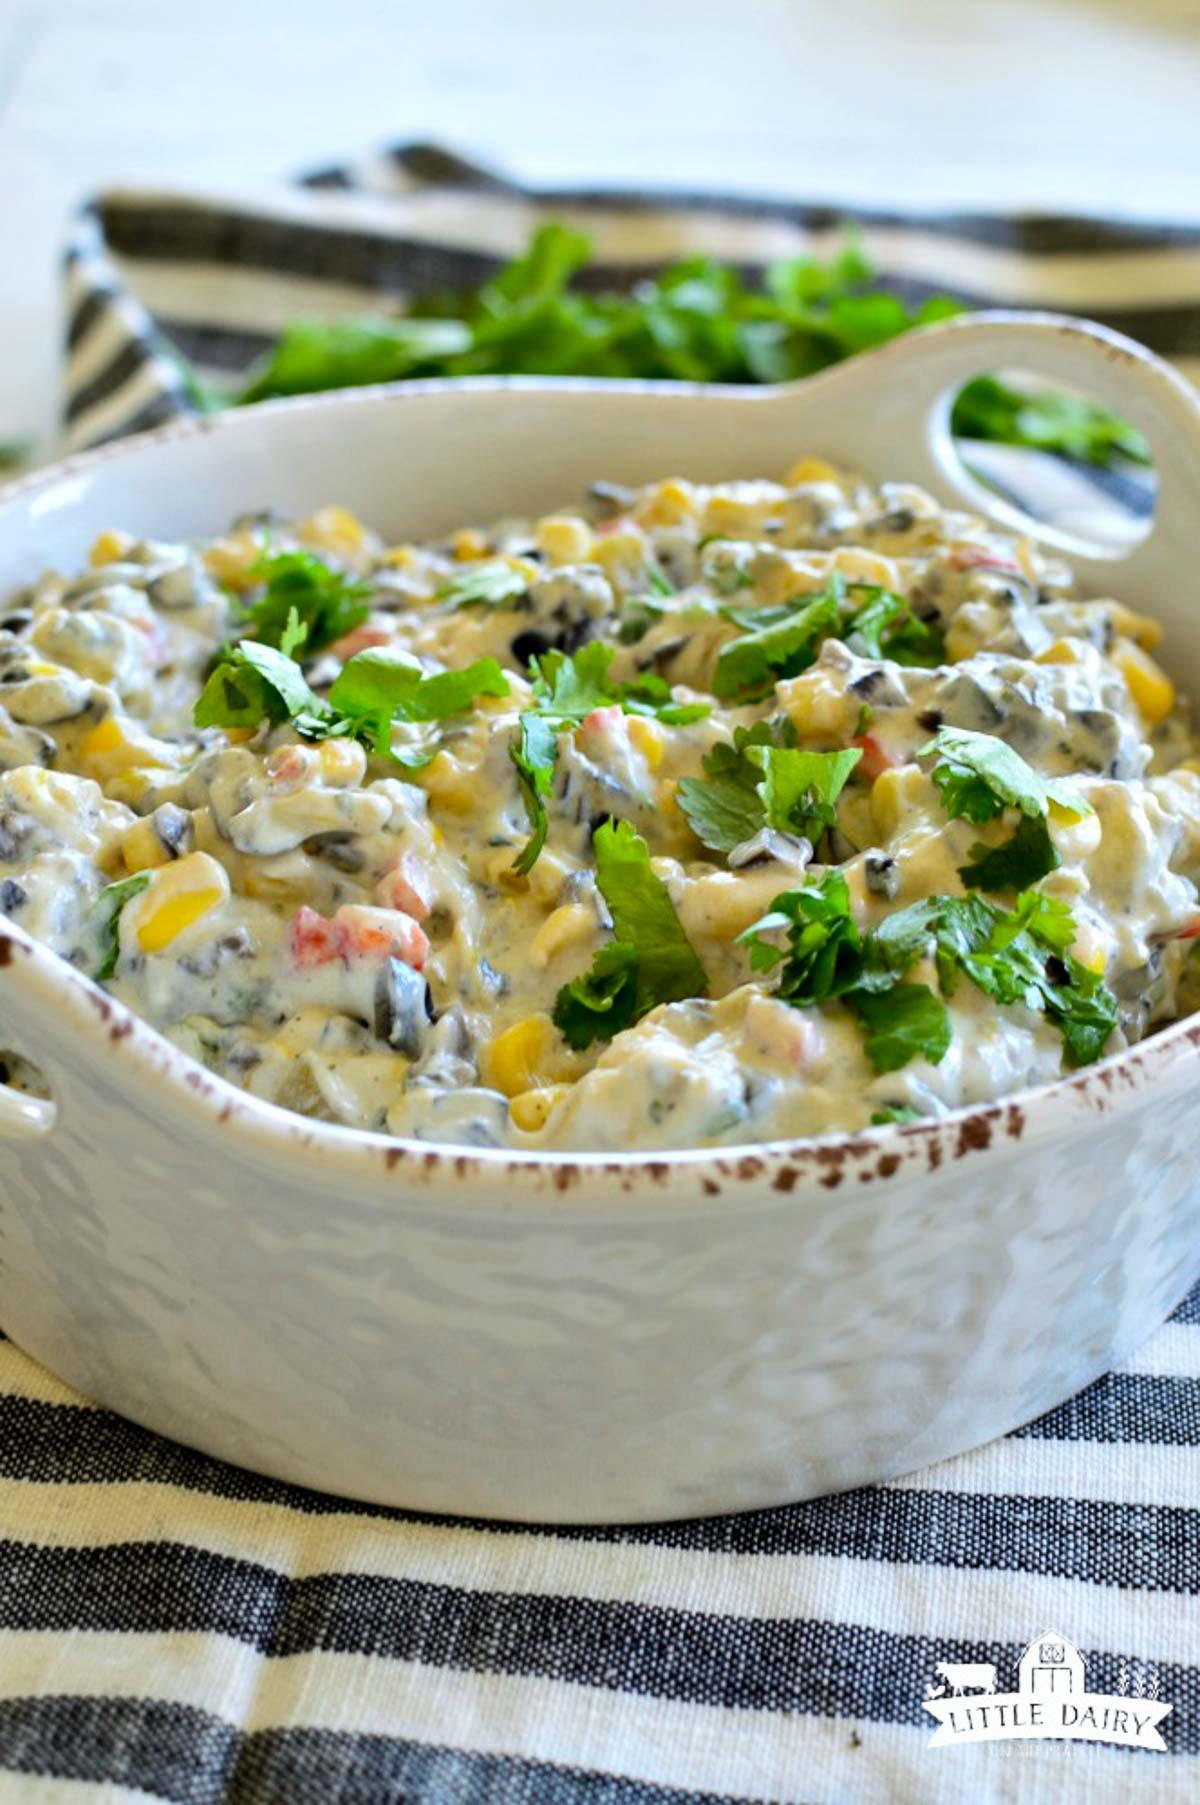 Veggie dip with fresh herbs on top of it.